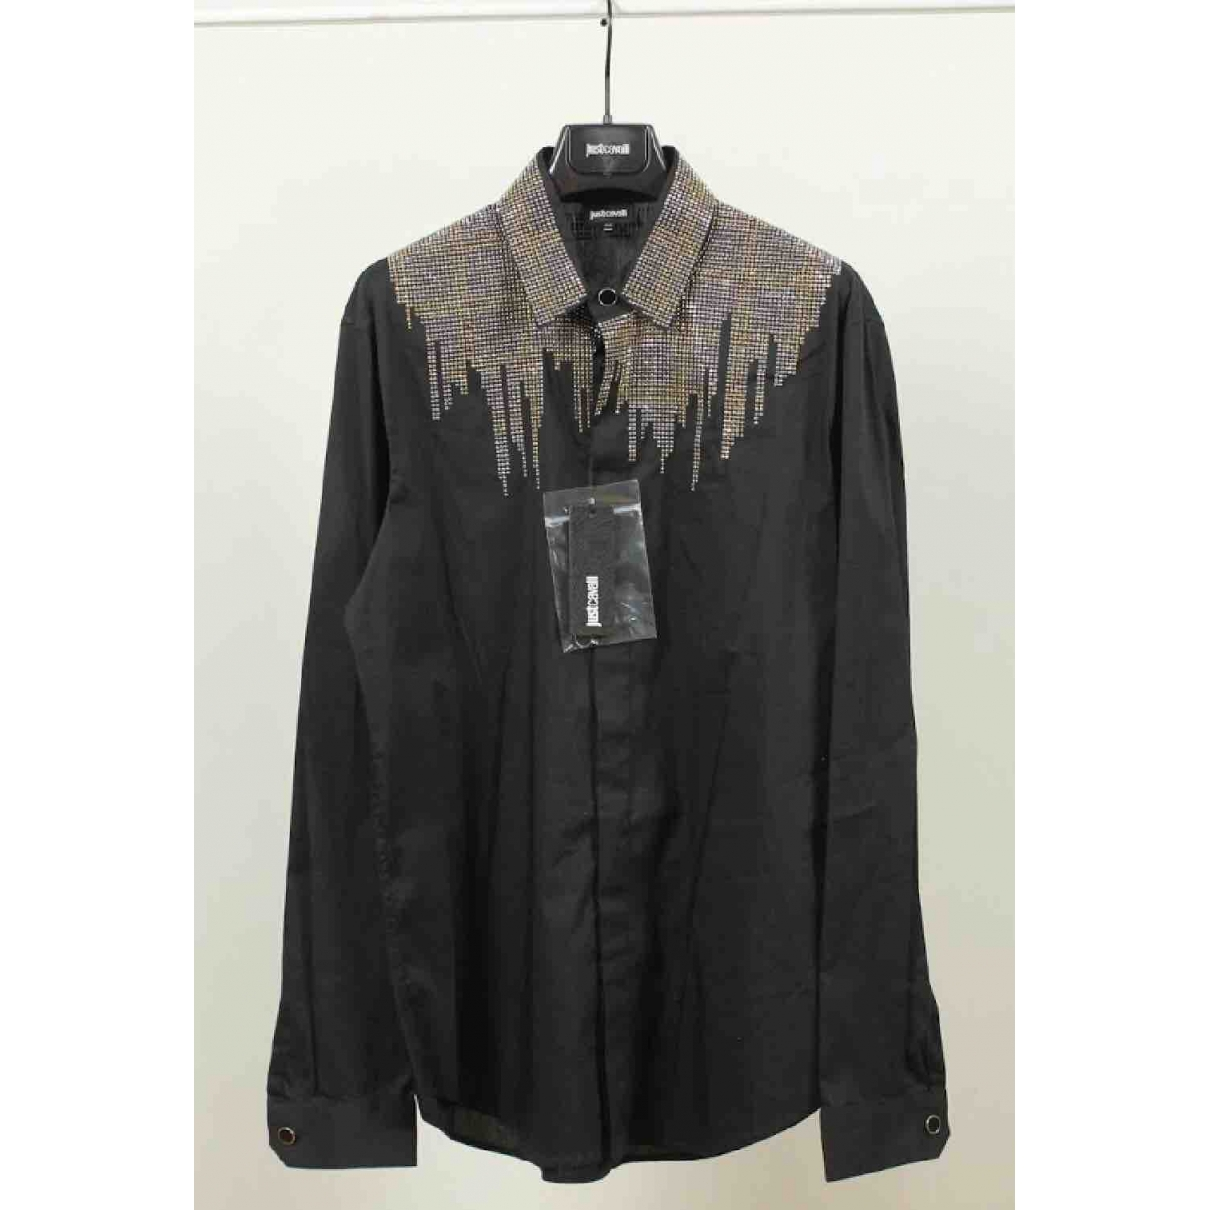 Just Cavalli \N Black Cotton Shirts for Men M International